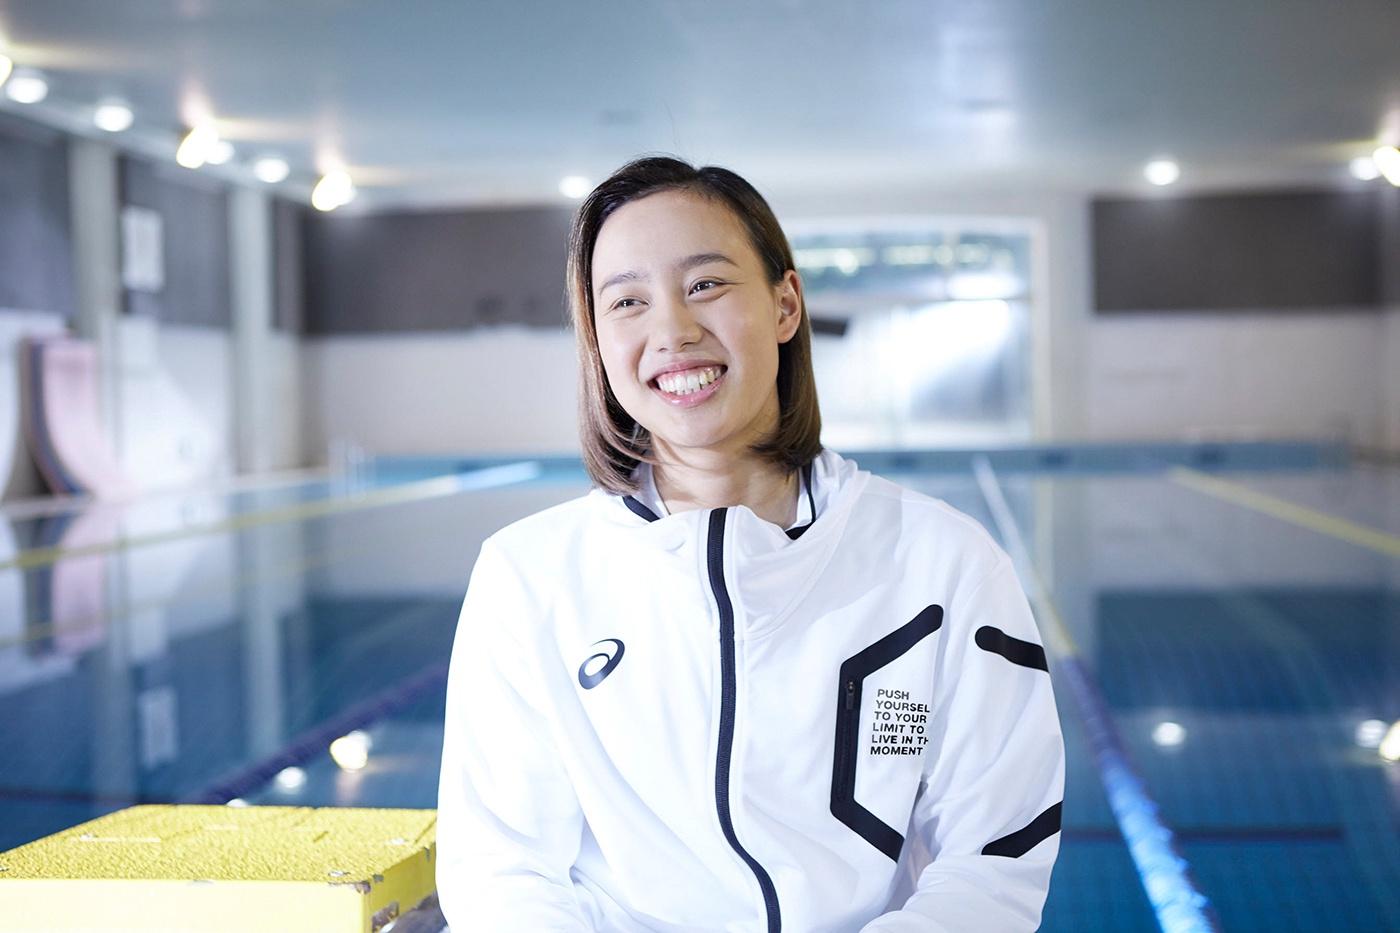 Meet The Athlete Vol 8 今井 月 Asics Japan